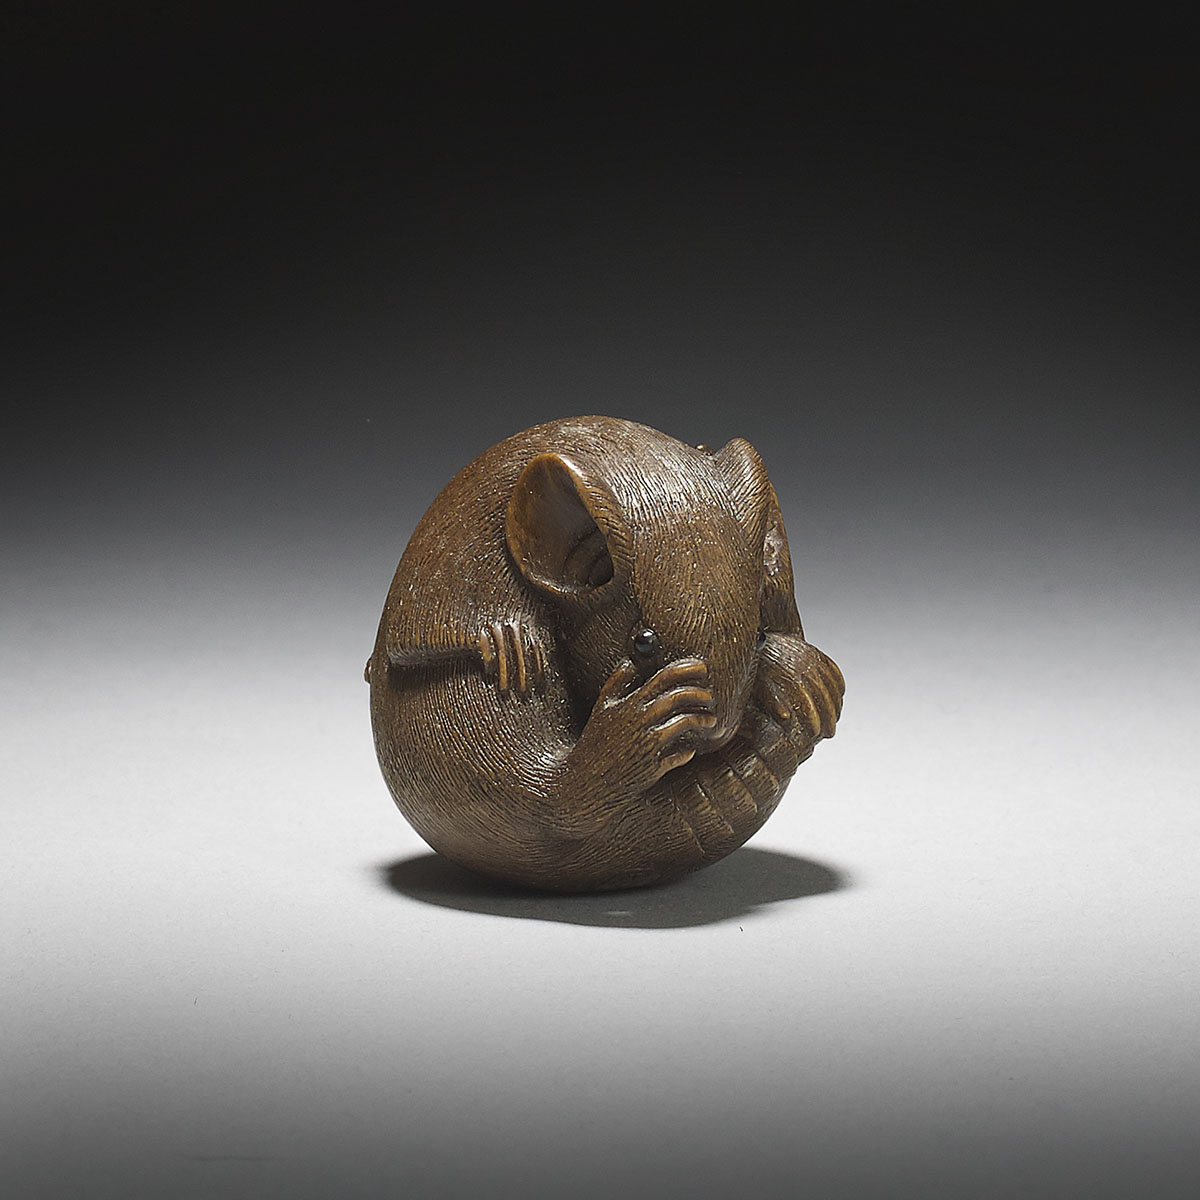 Wood netsuke of a balled rat, Sakai Masami, MR2967_v1